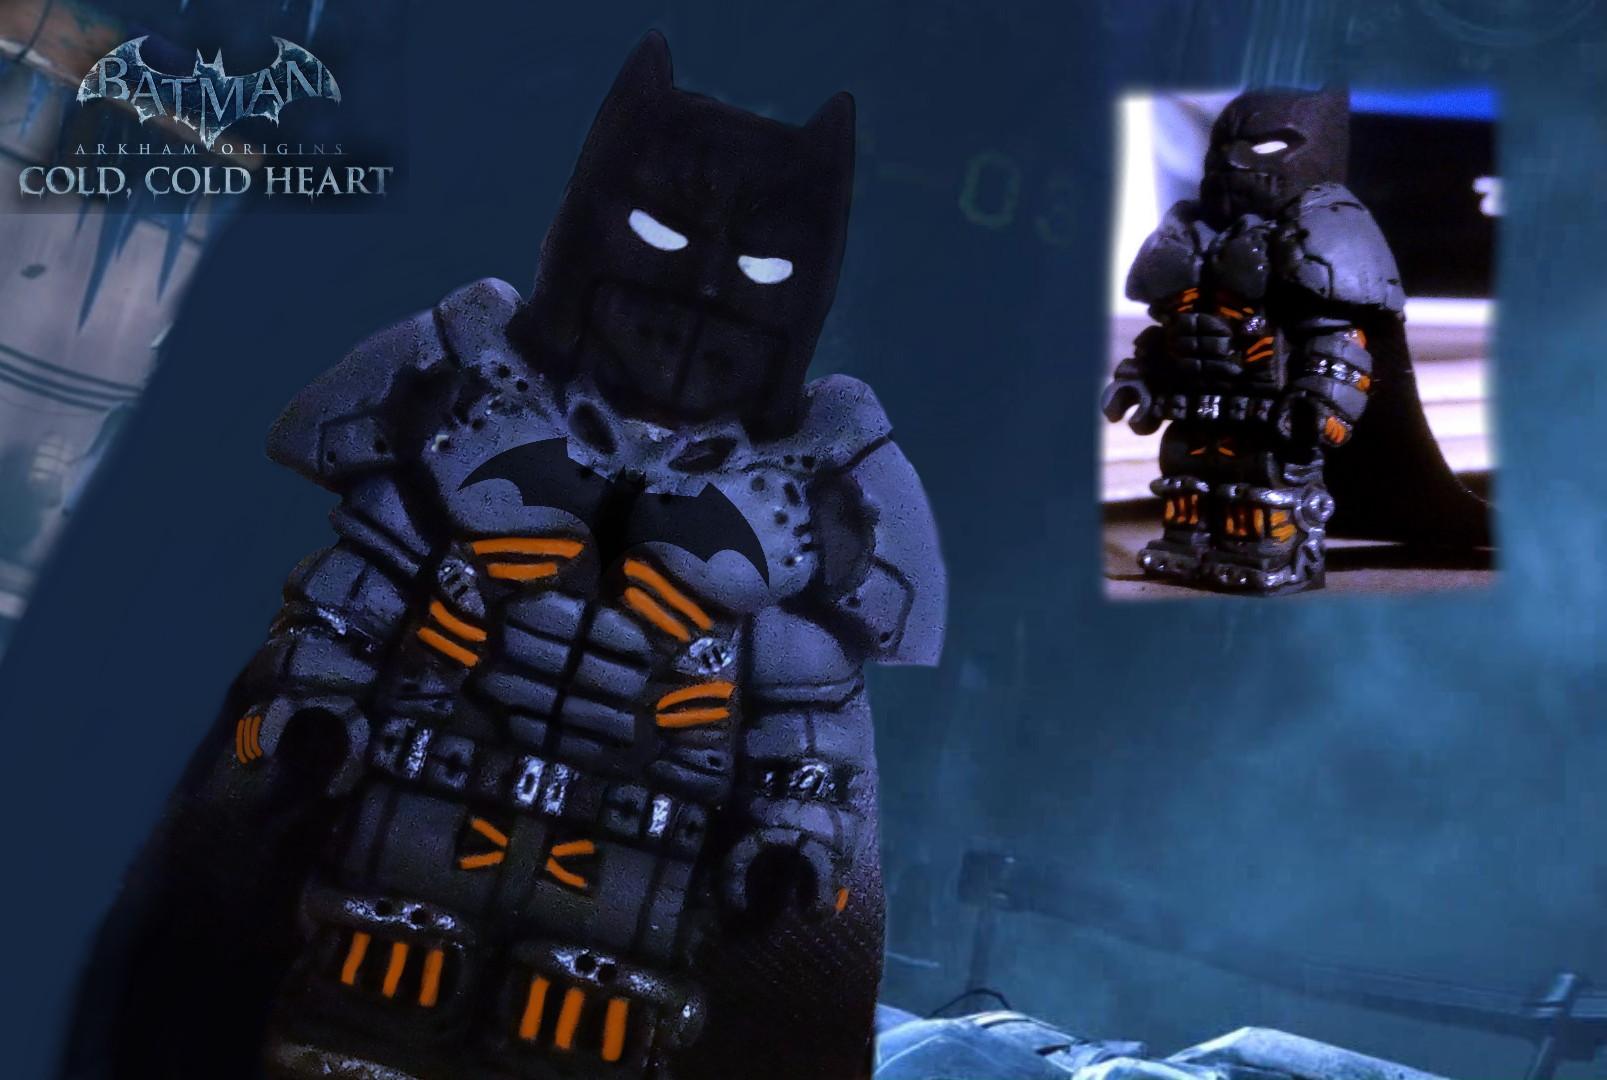 Lego batman arkham origins artfiks custom xesuit